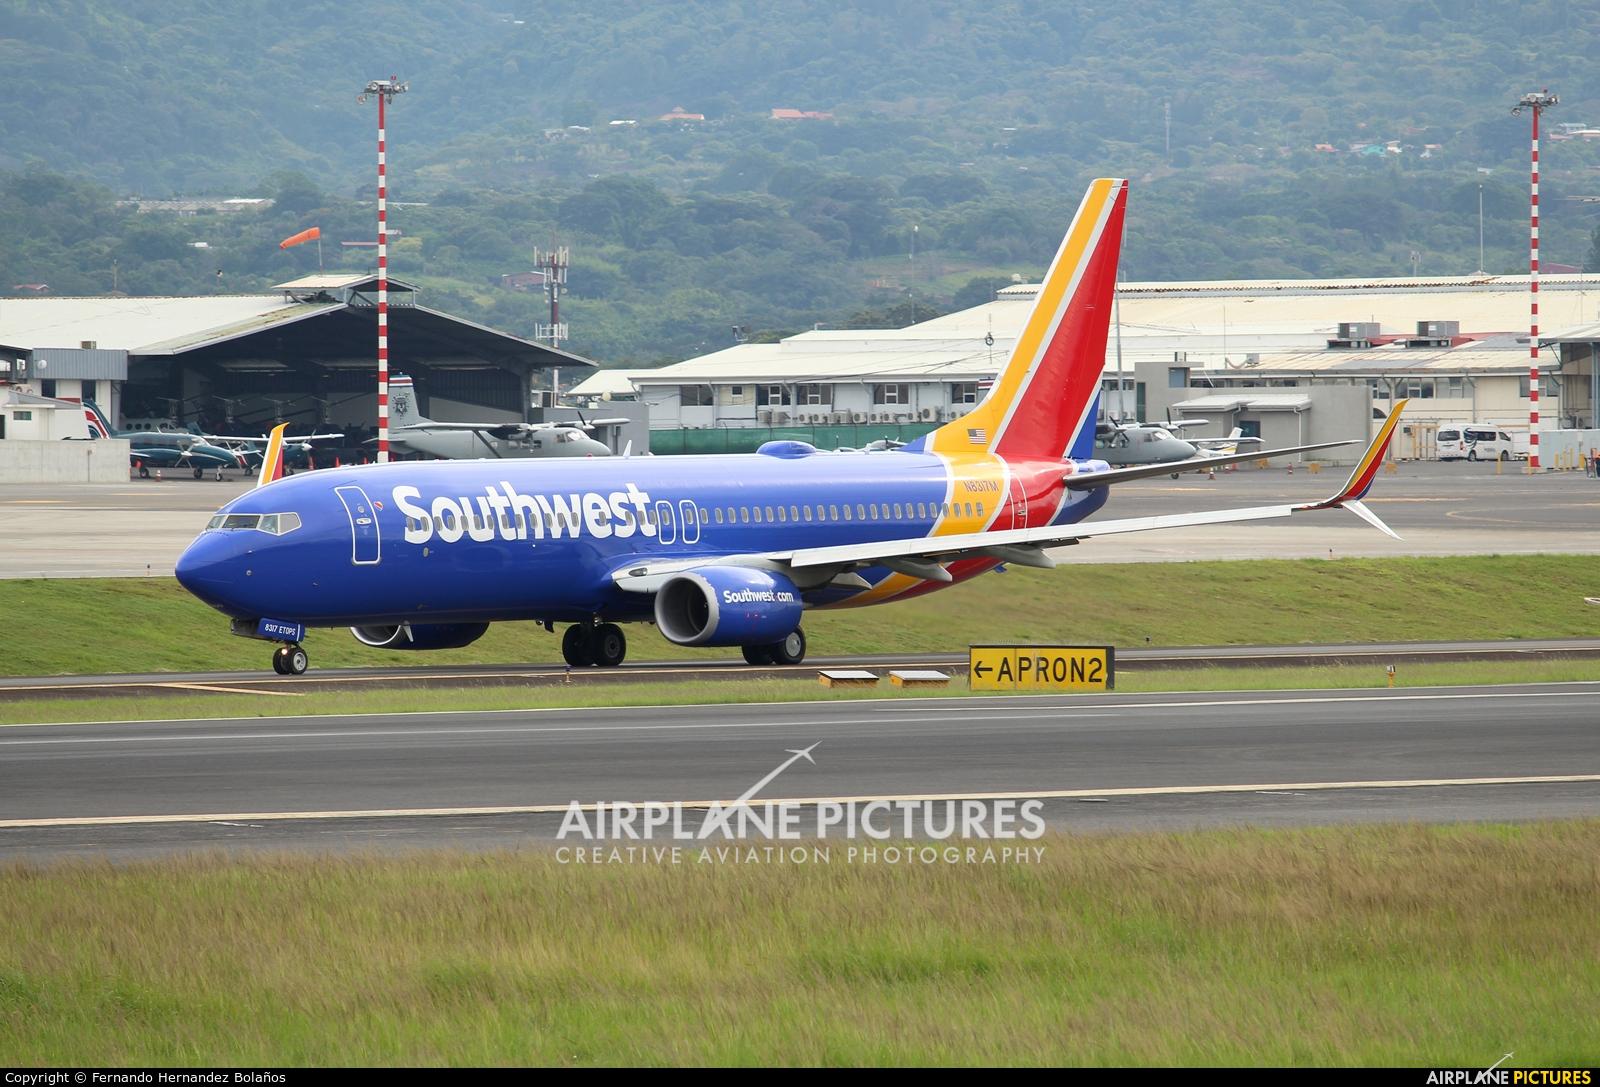 Southwest Airlines N8317M aircraft at San Jose - Juan Santamaría Intl